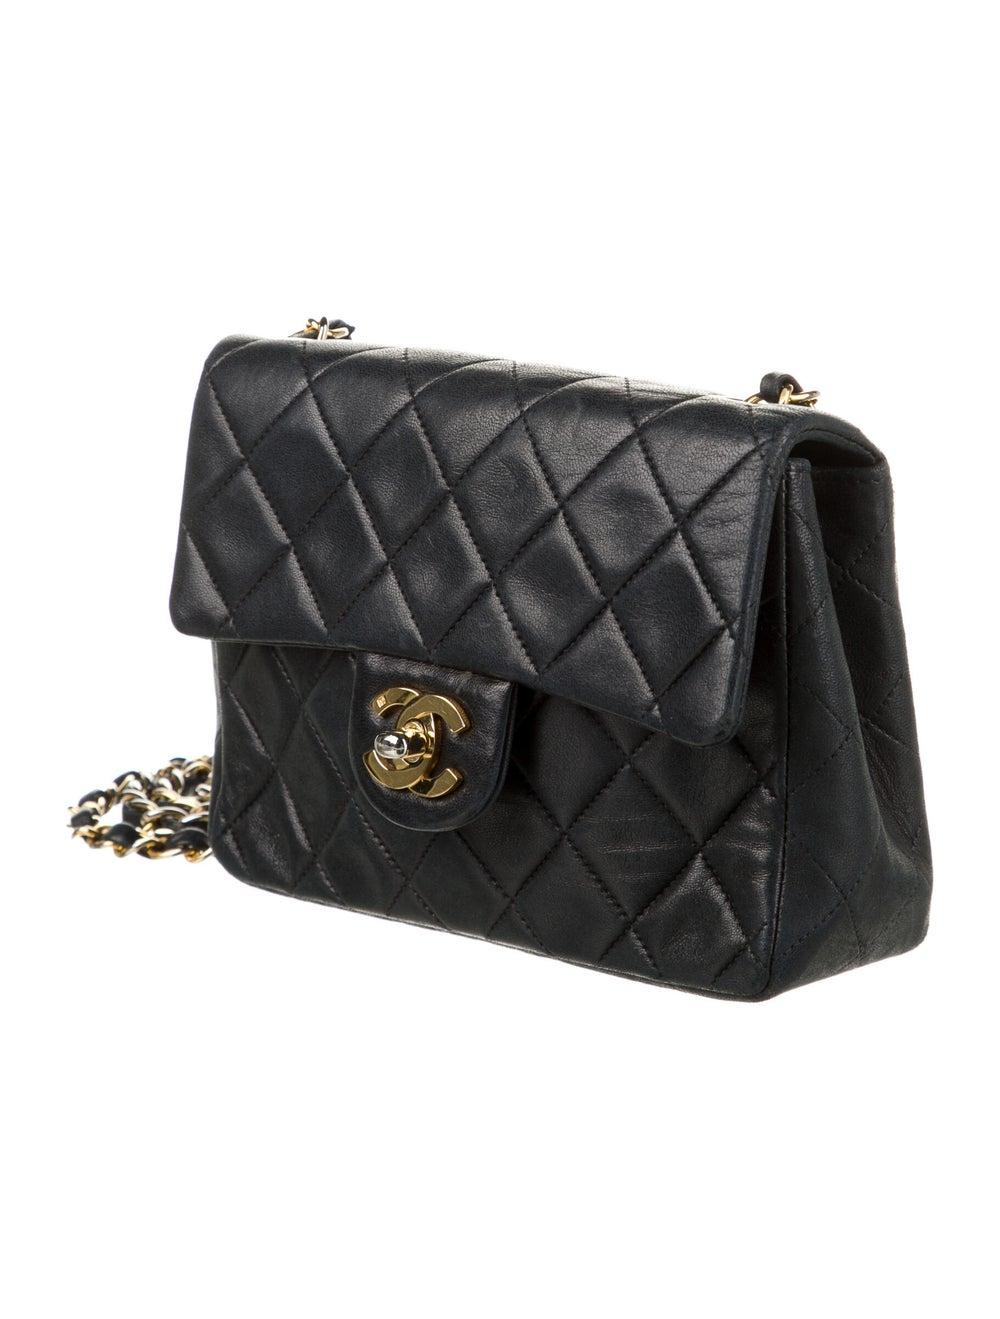 Chanel Vintage Classic Mini Square Flap Bag Blue - image 3